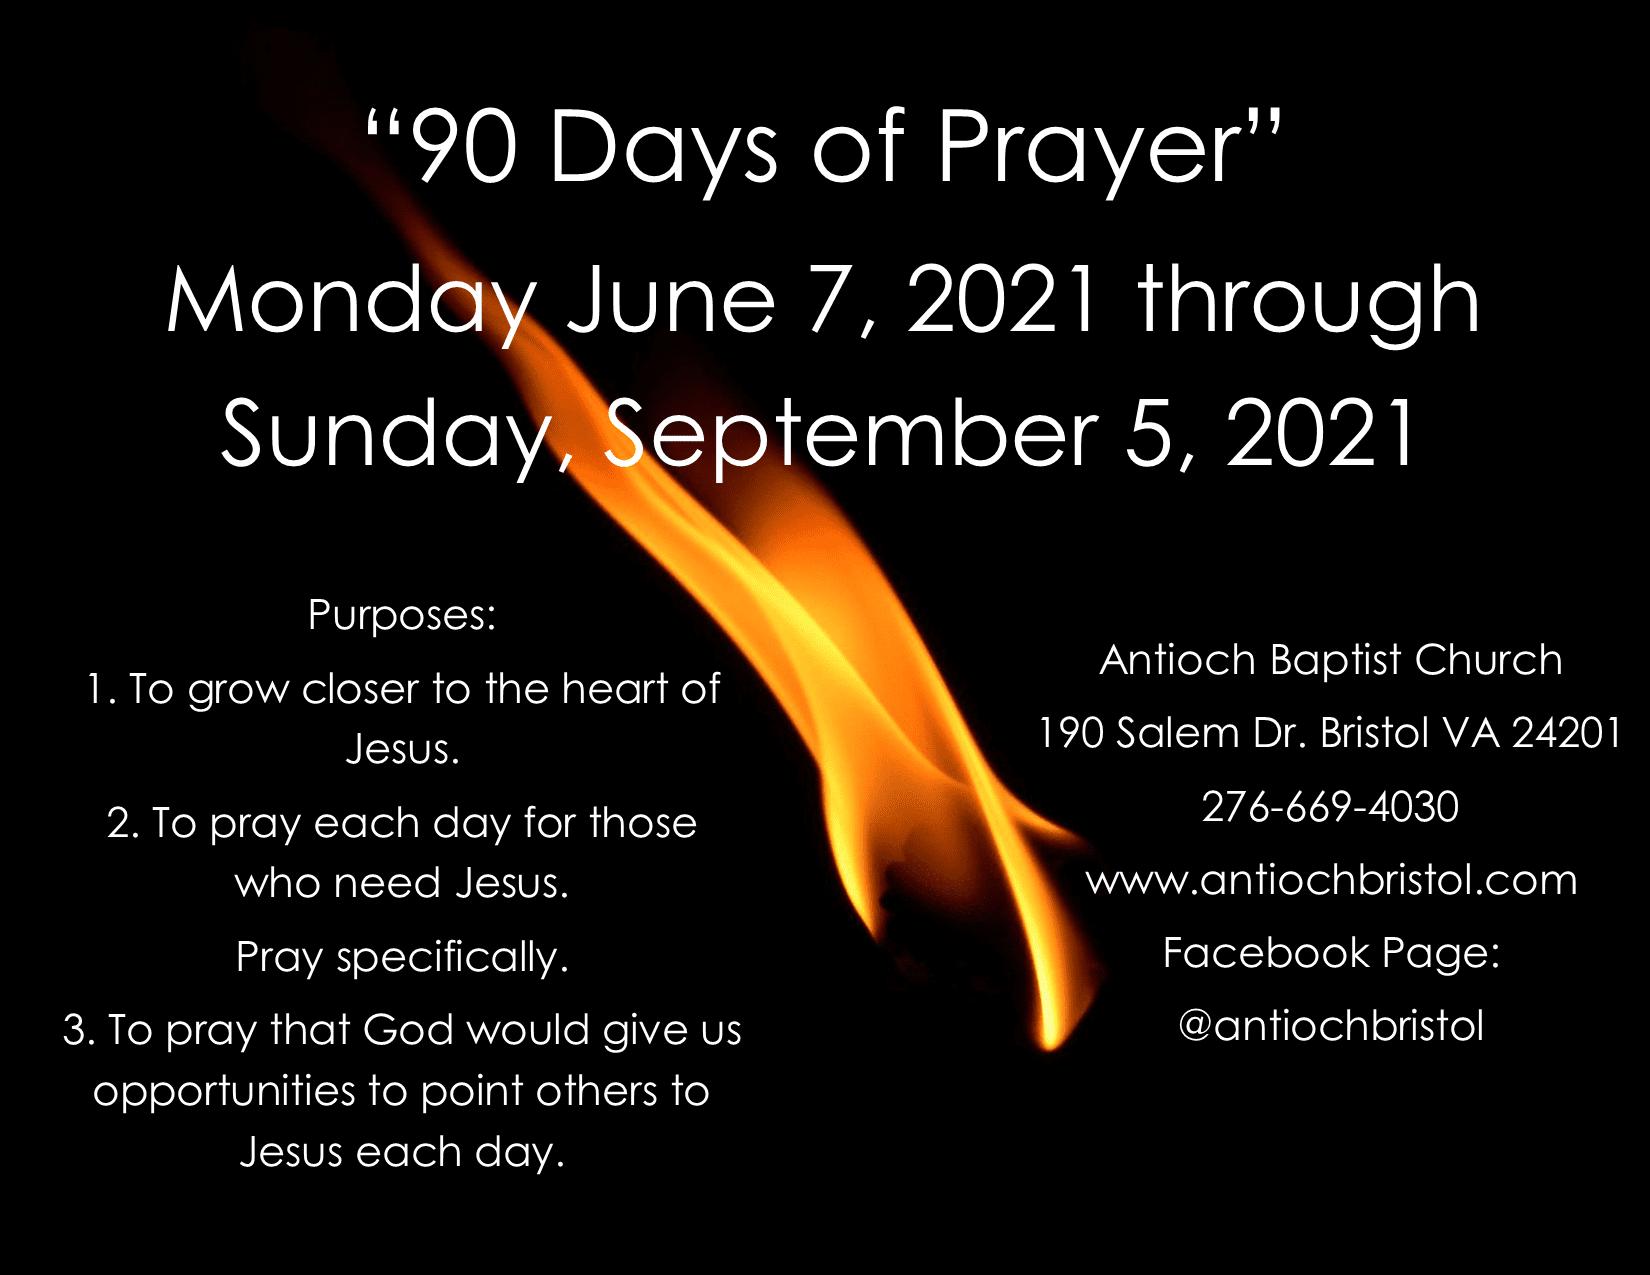 90DaysofPrayer2021-06-07